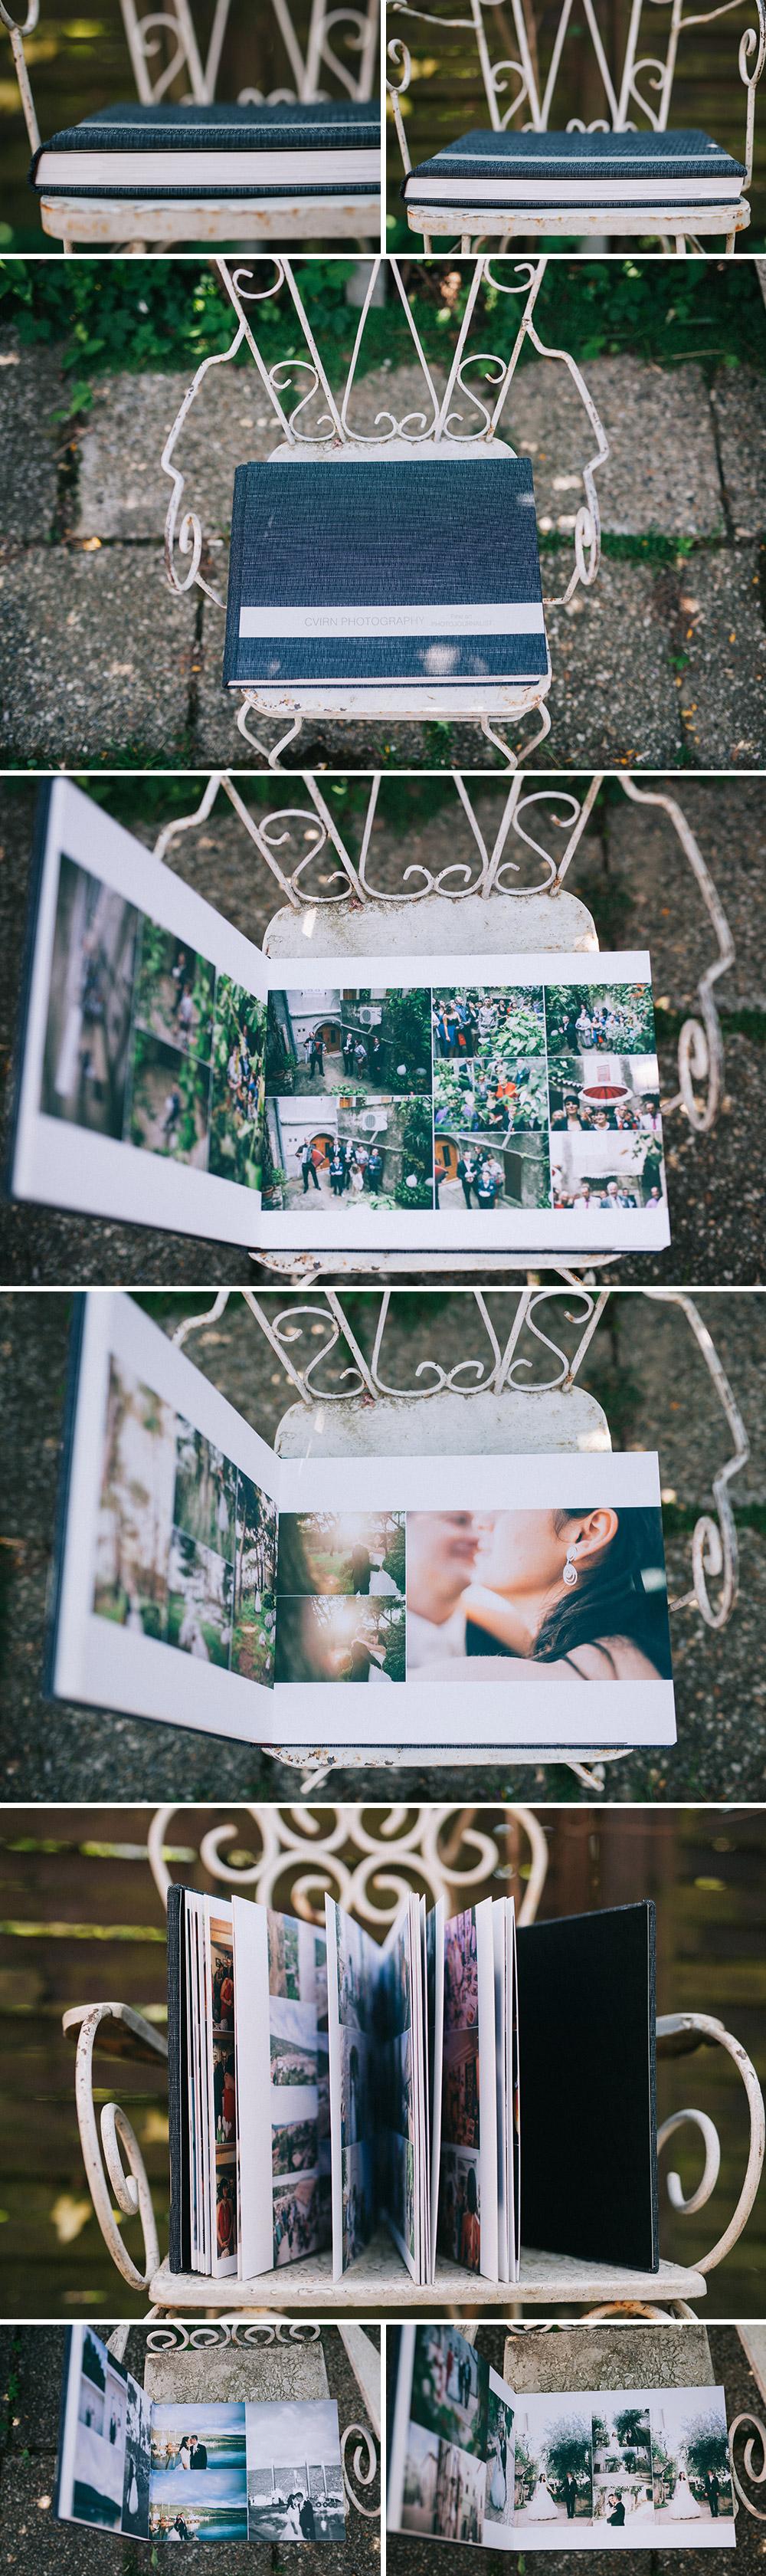 Blog-Collage-1429648873842